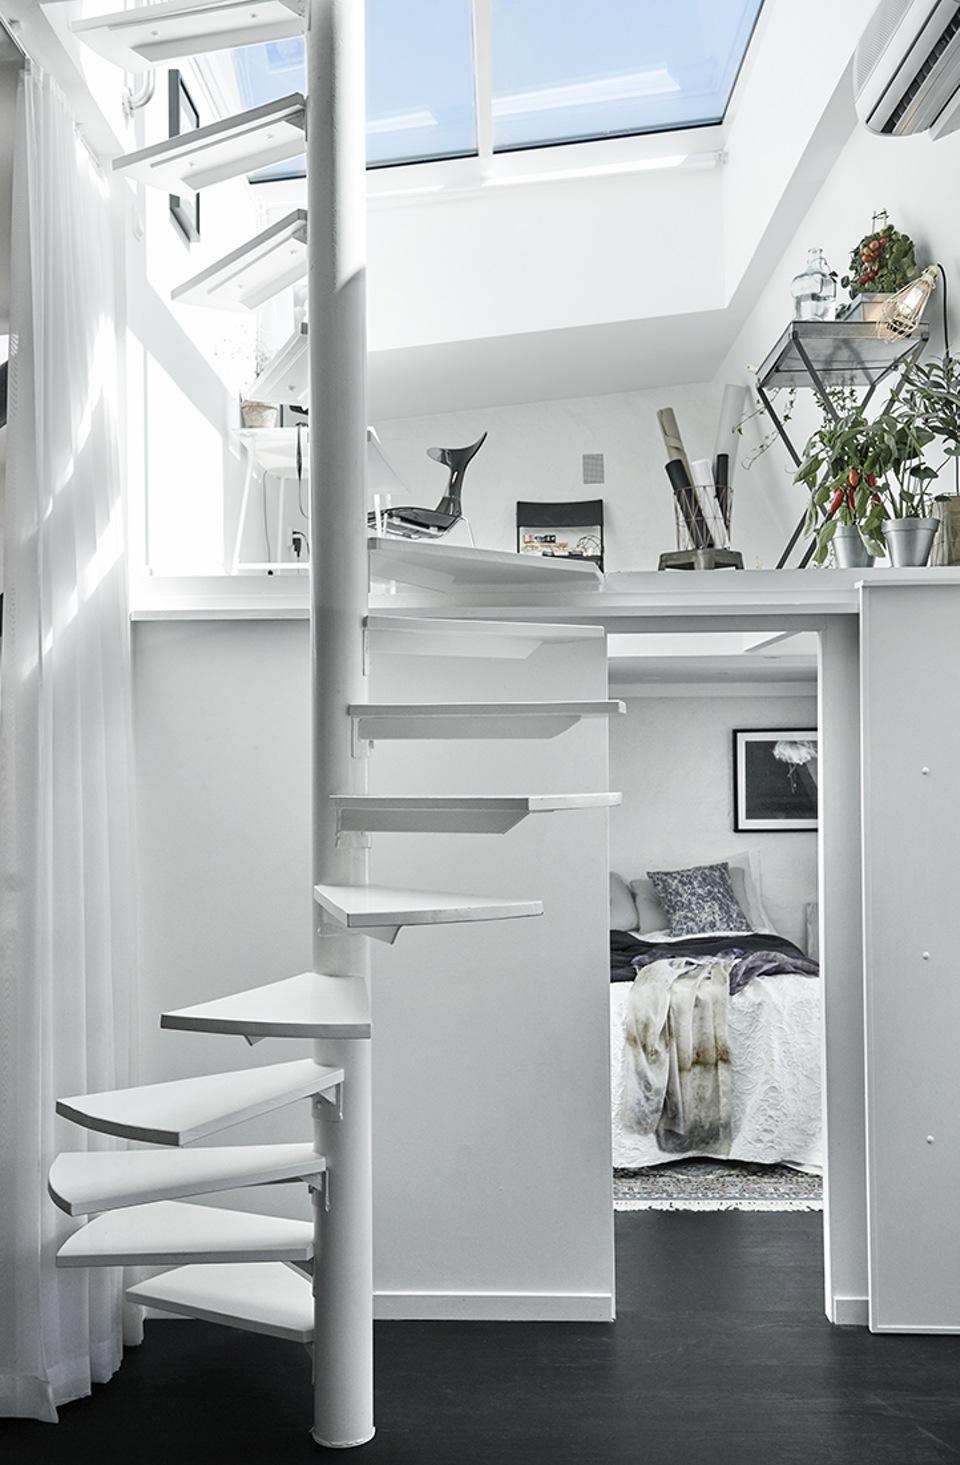 casa-blanco-negro-12